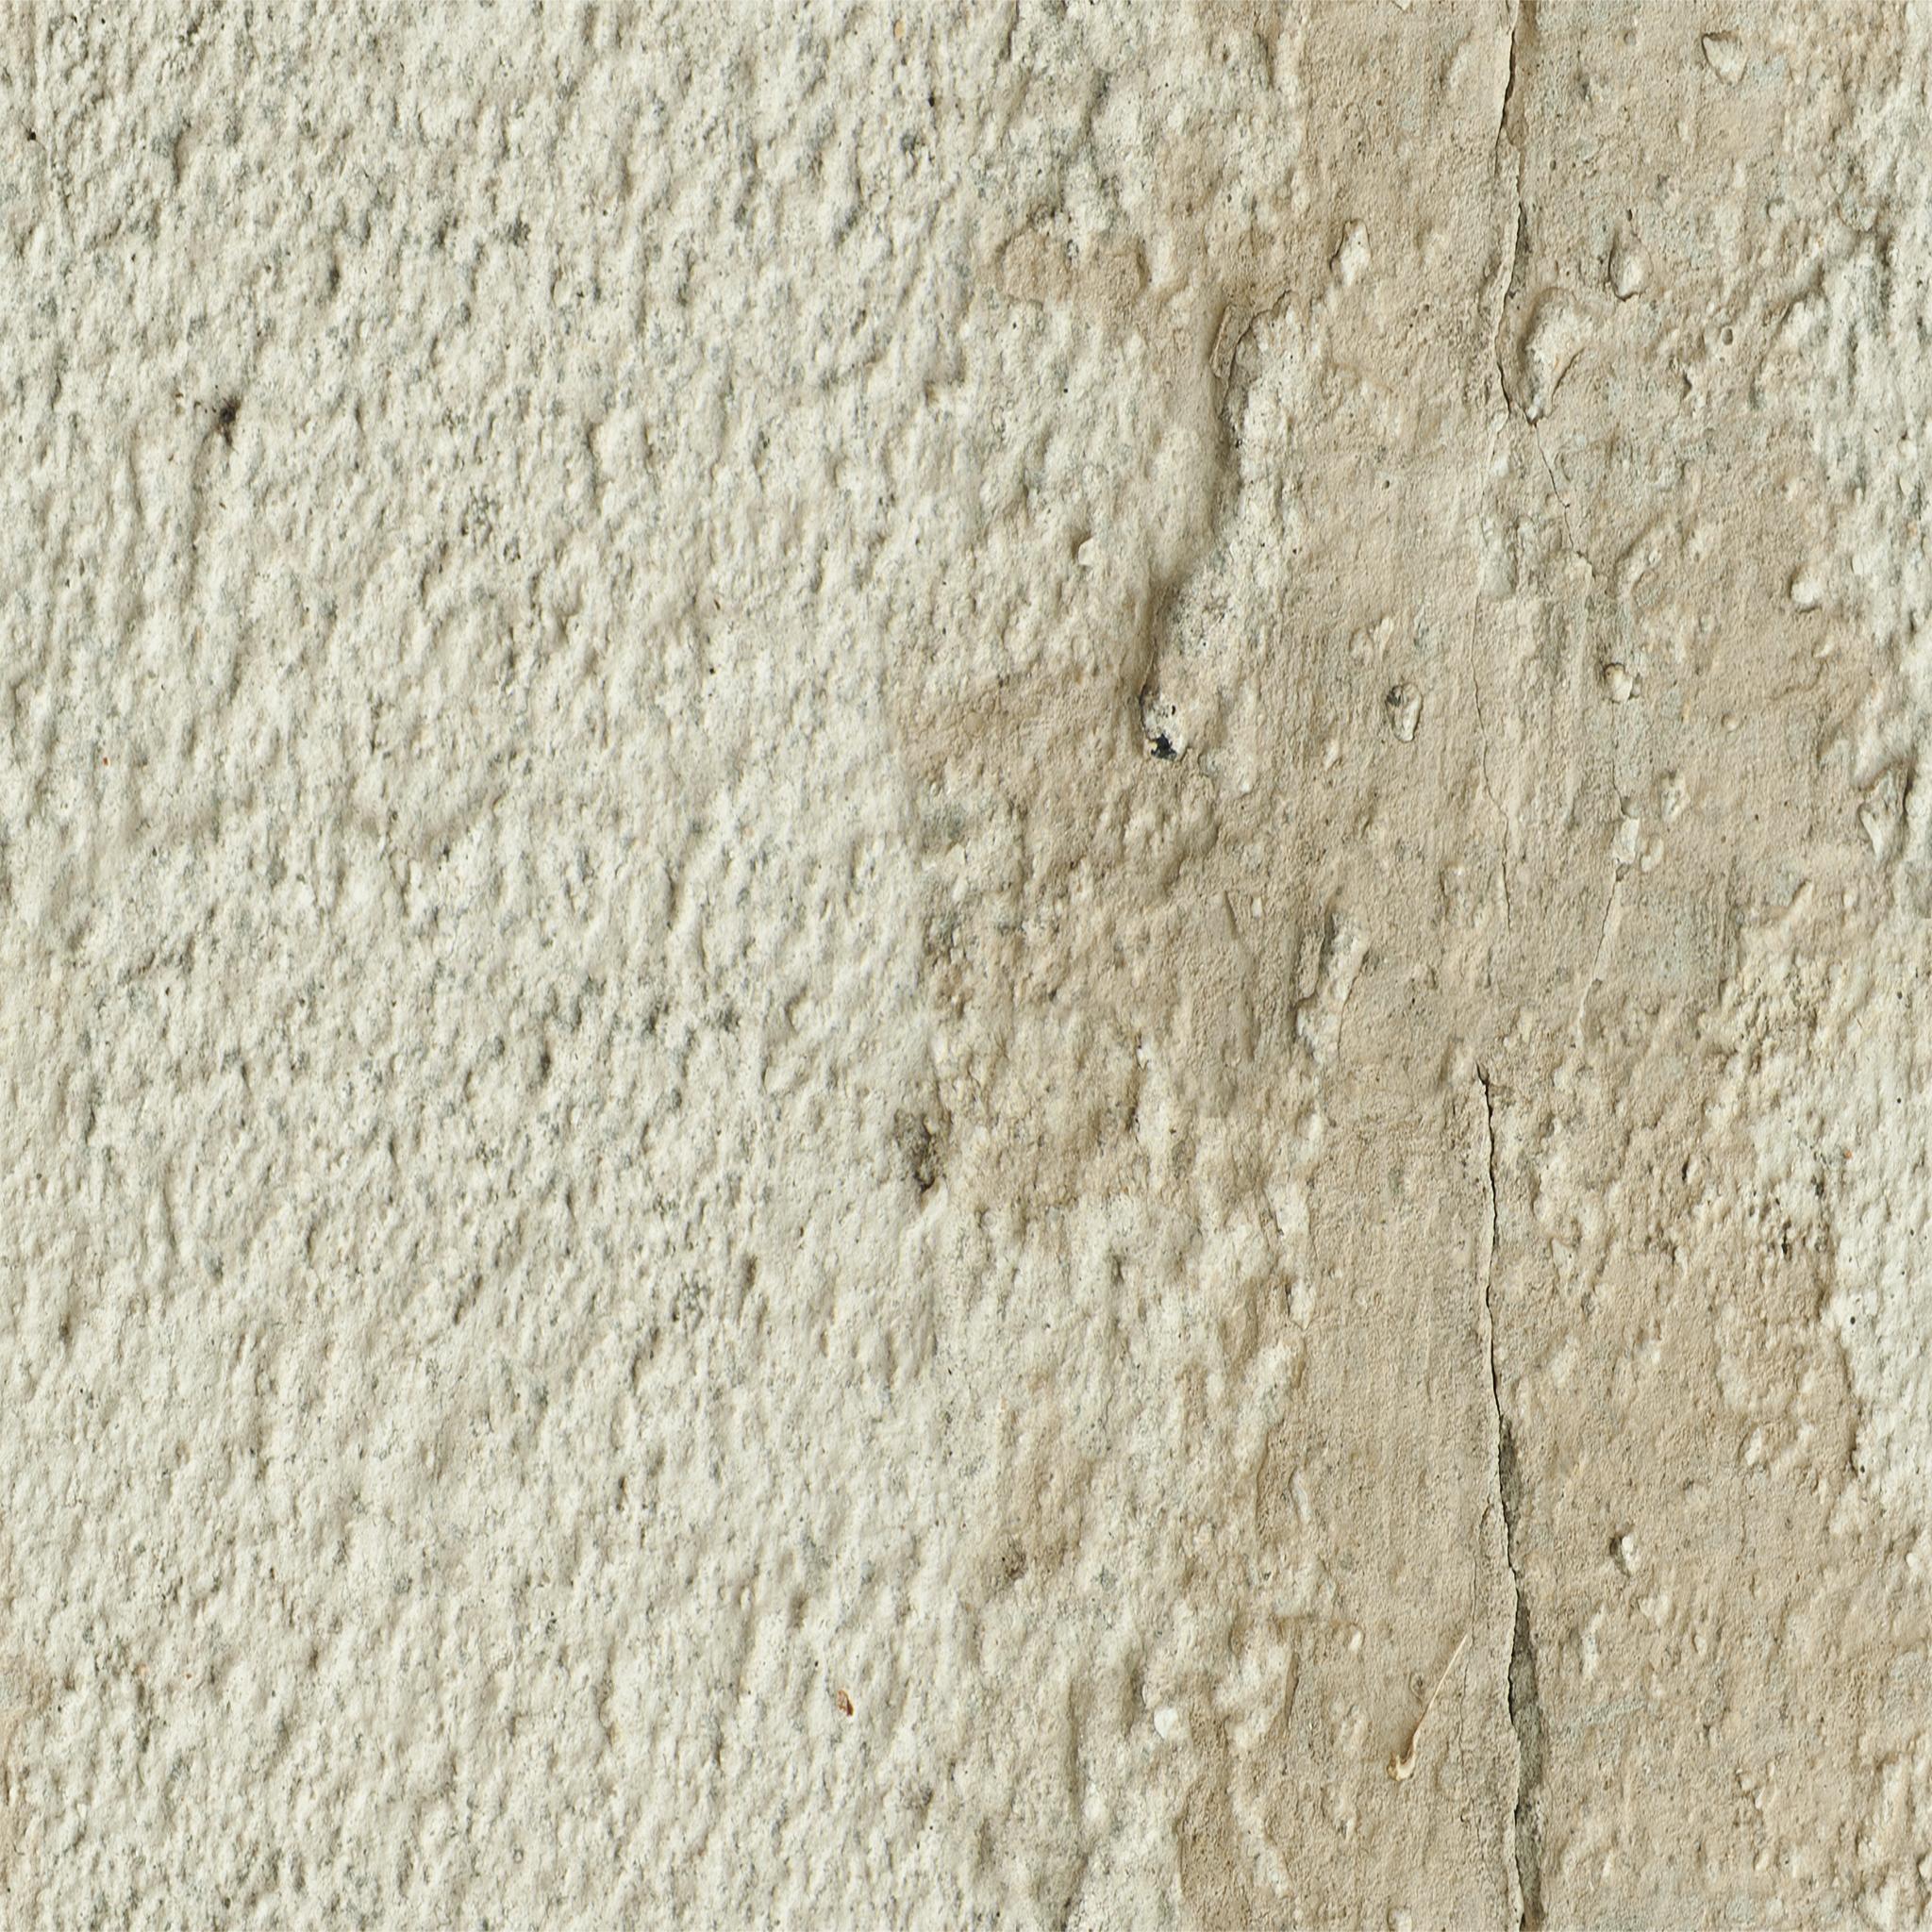 White Patchy Concrete.jpg